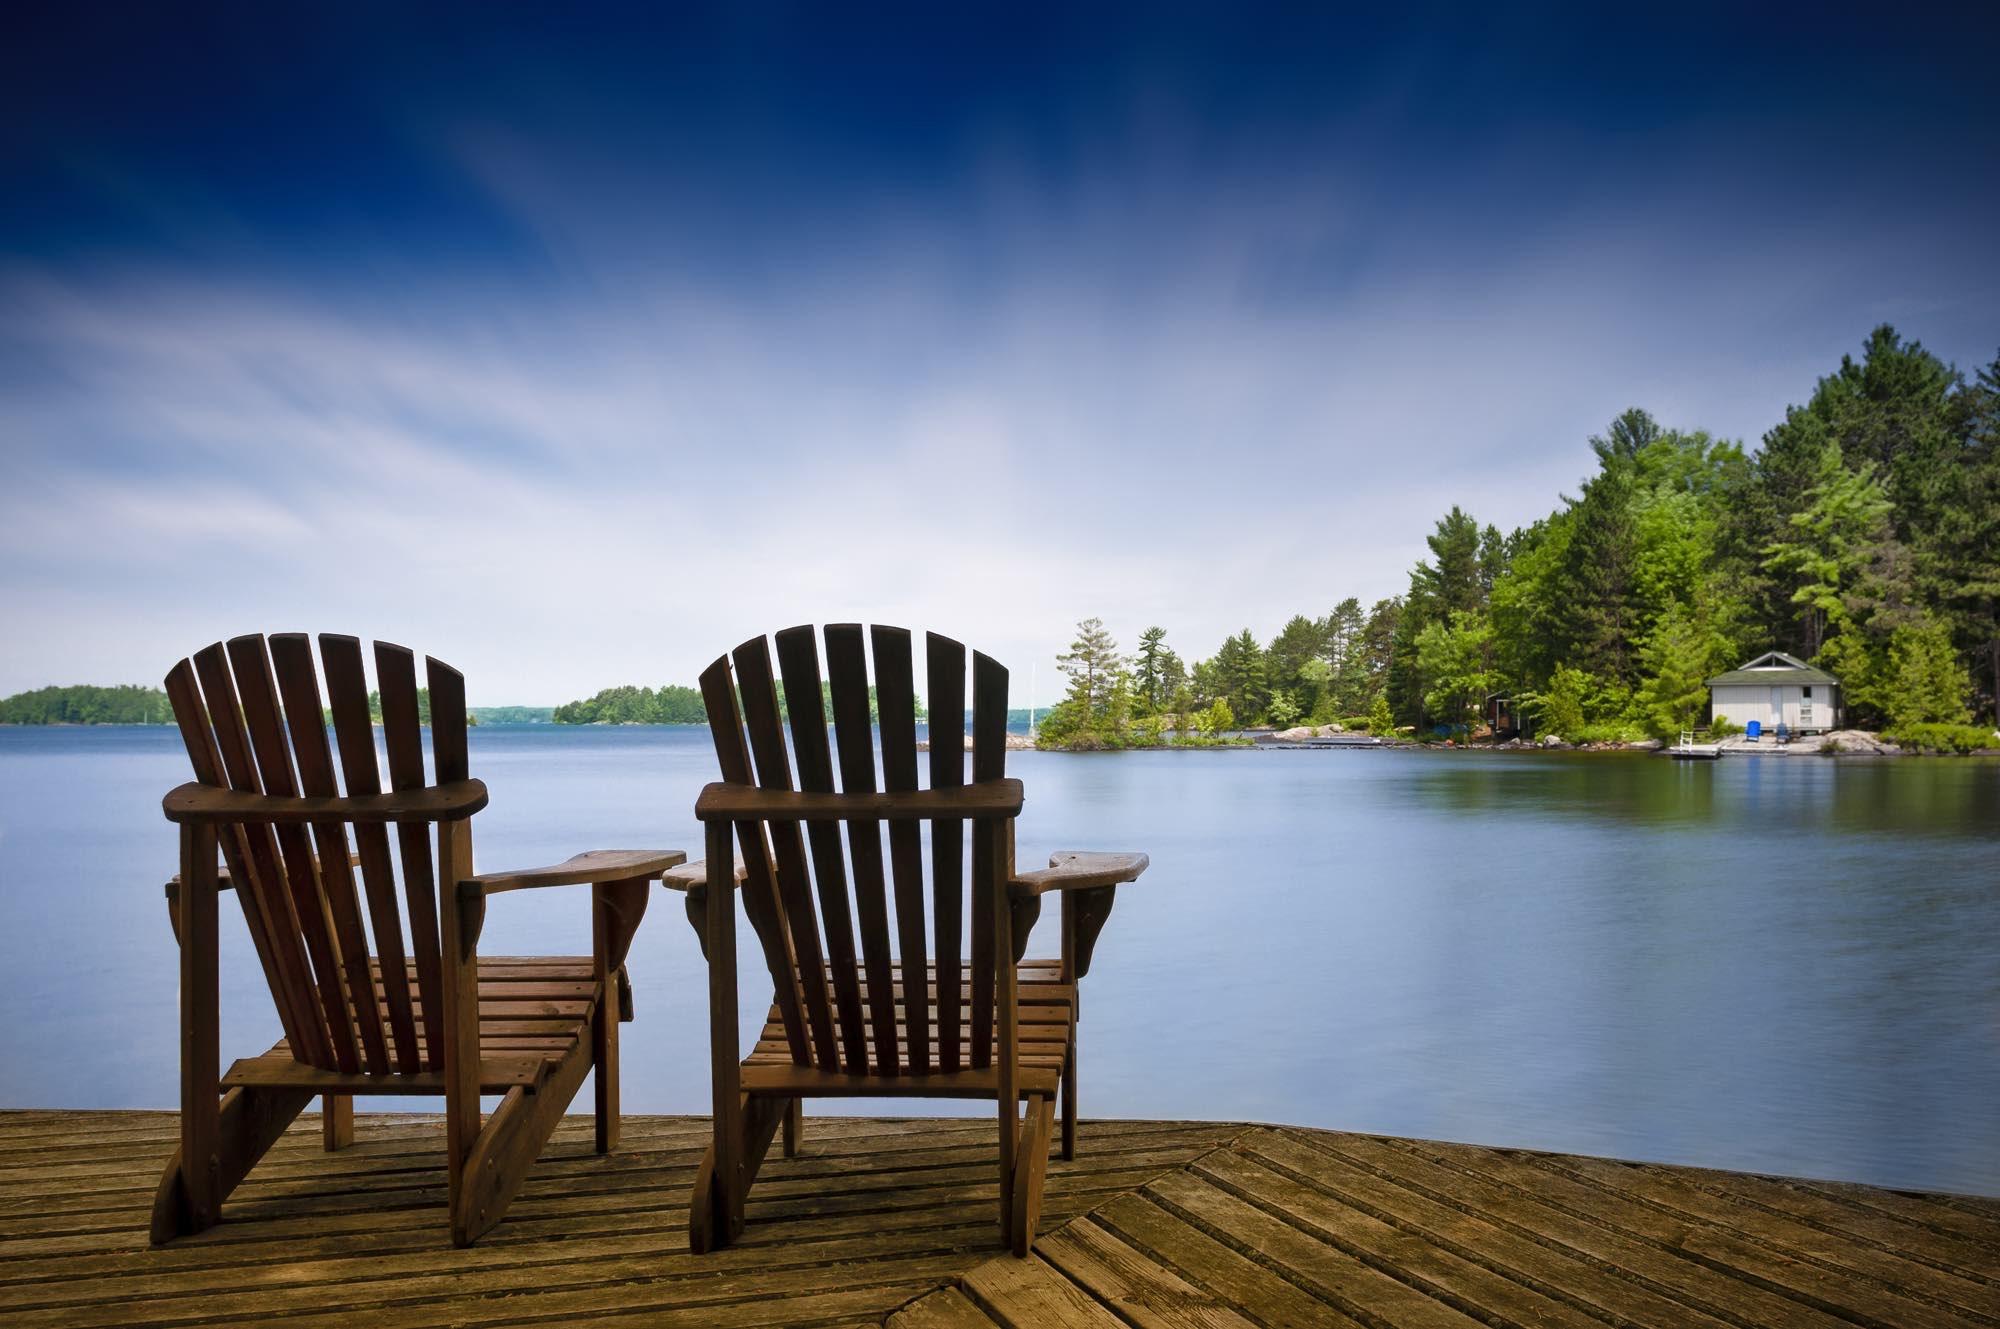 lakeside-chairs